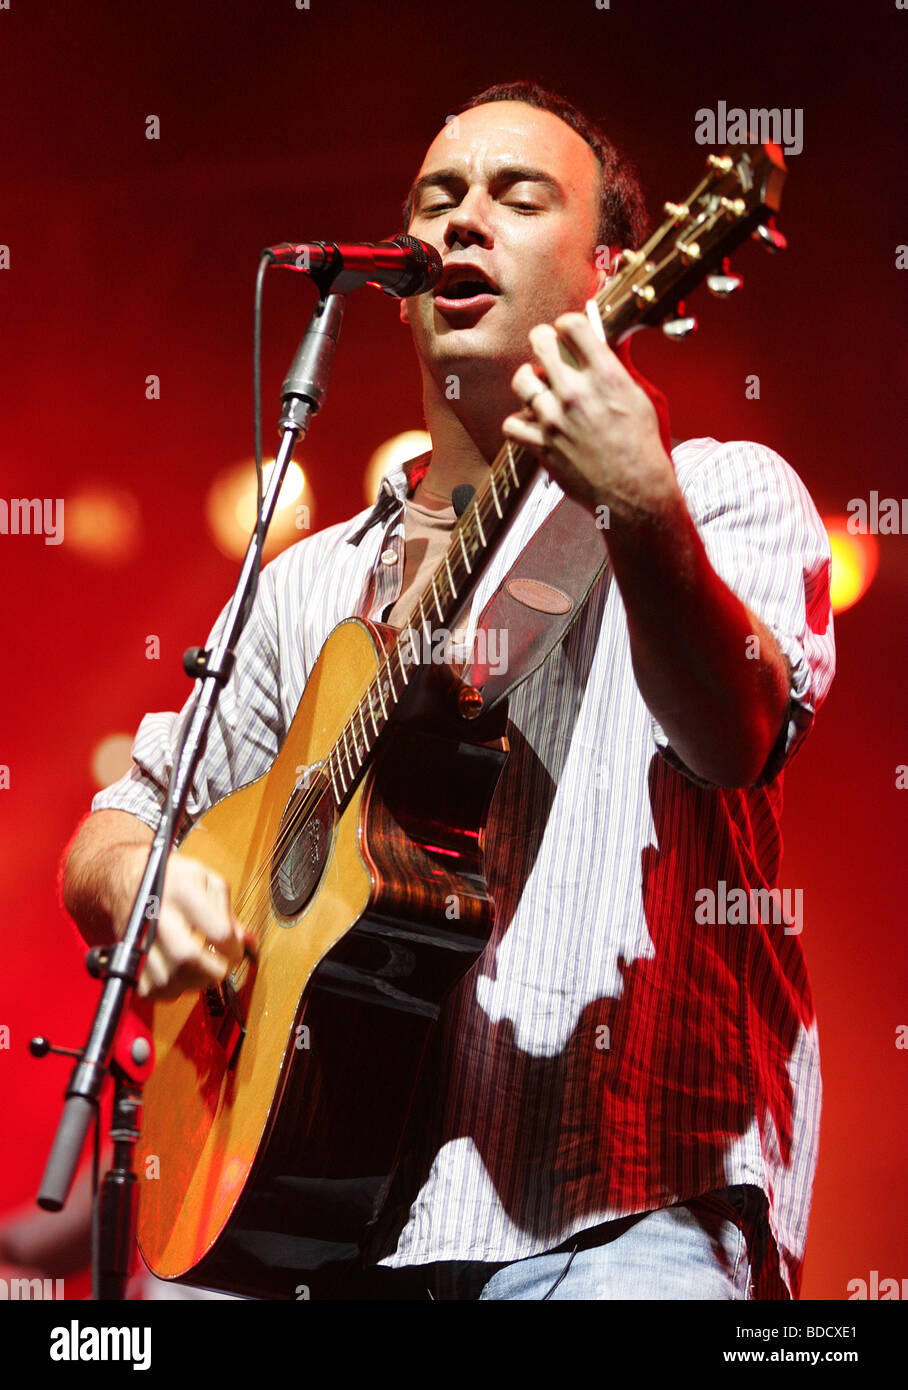 DAVE MATTHEWS - US rock musician - Stock Image